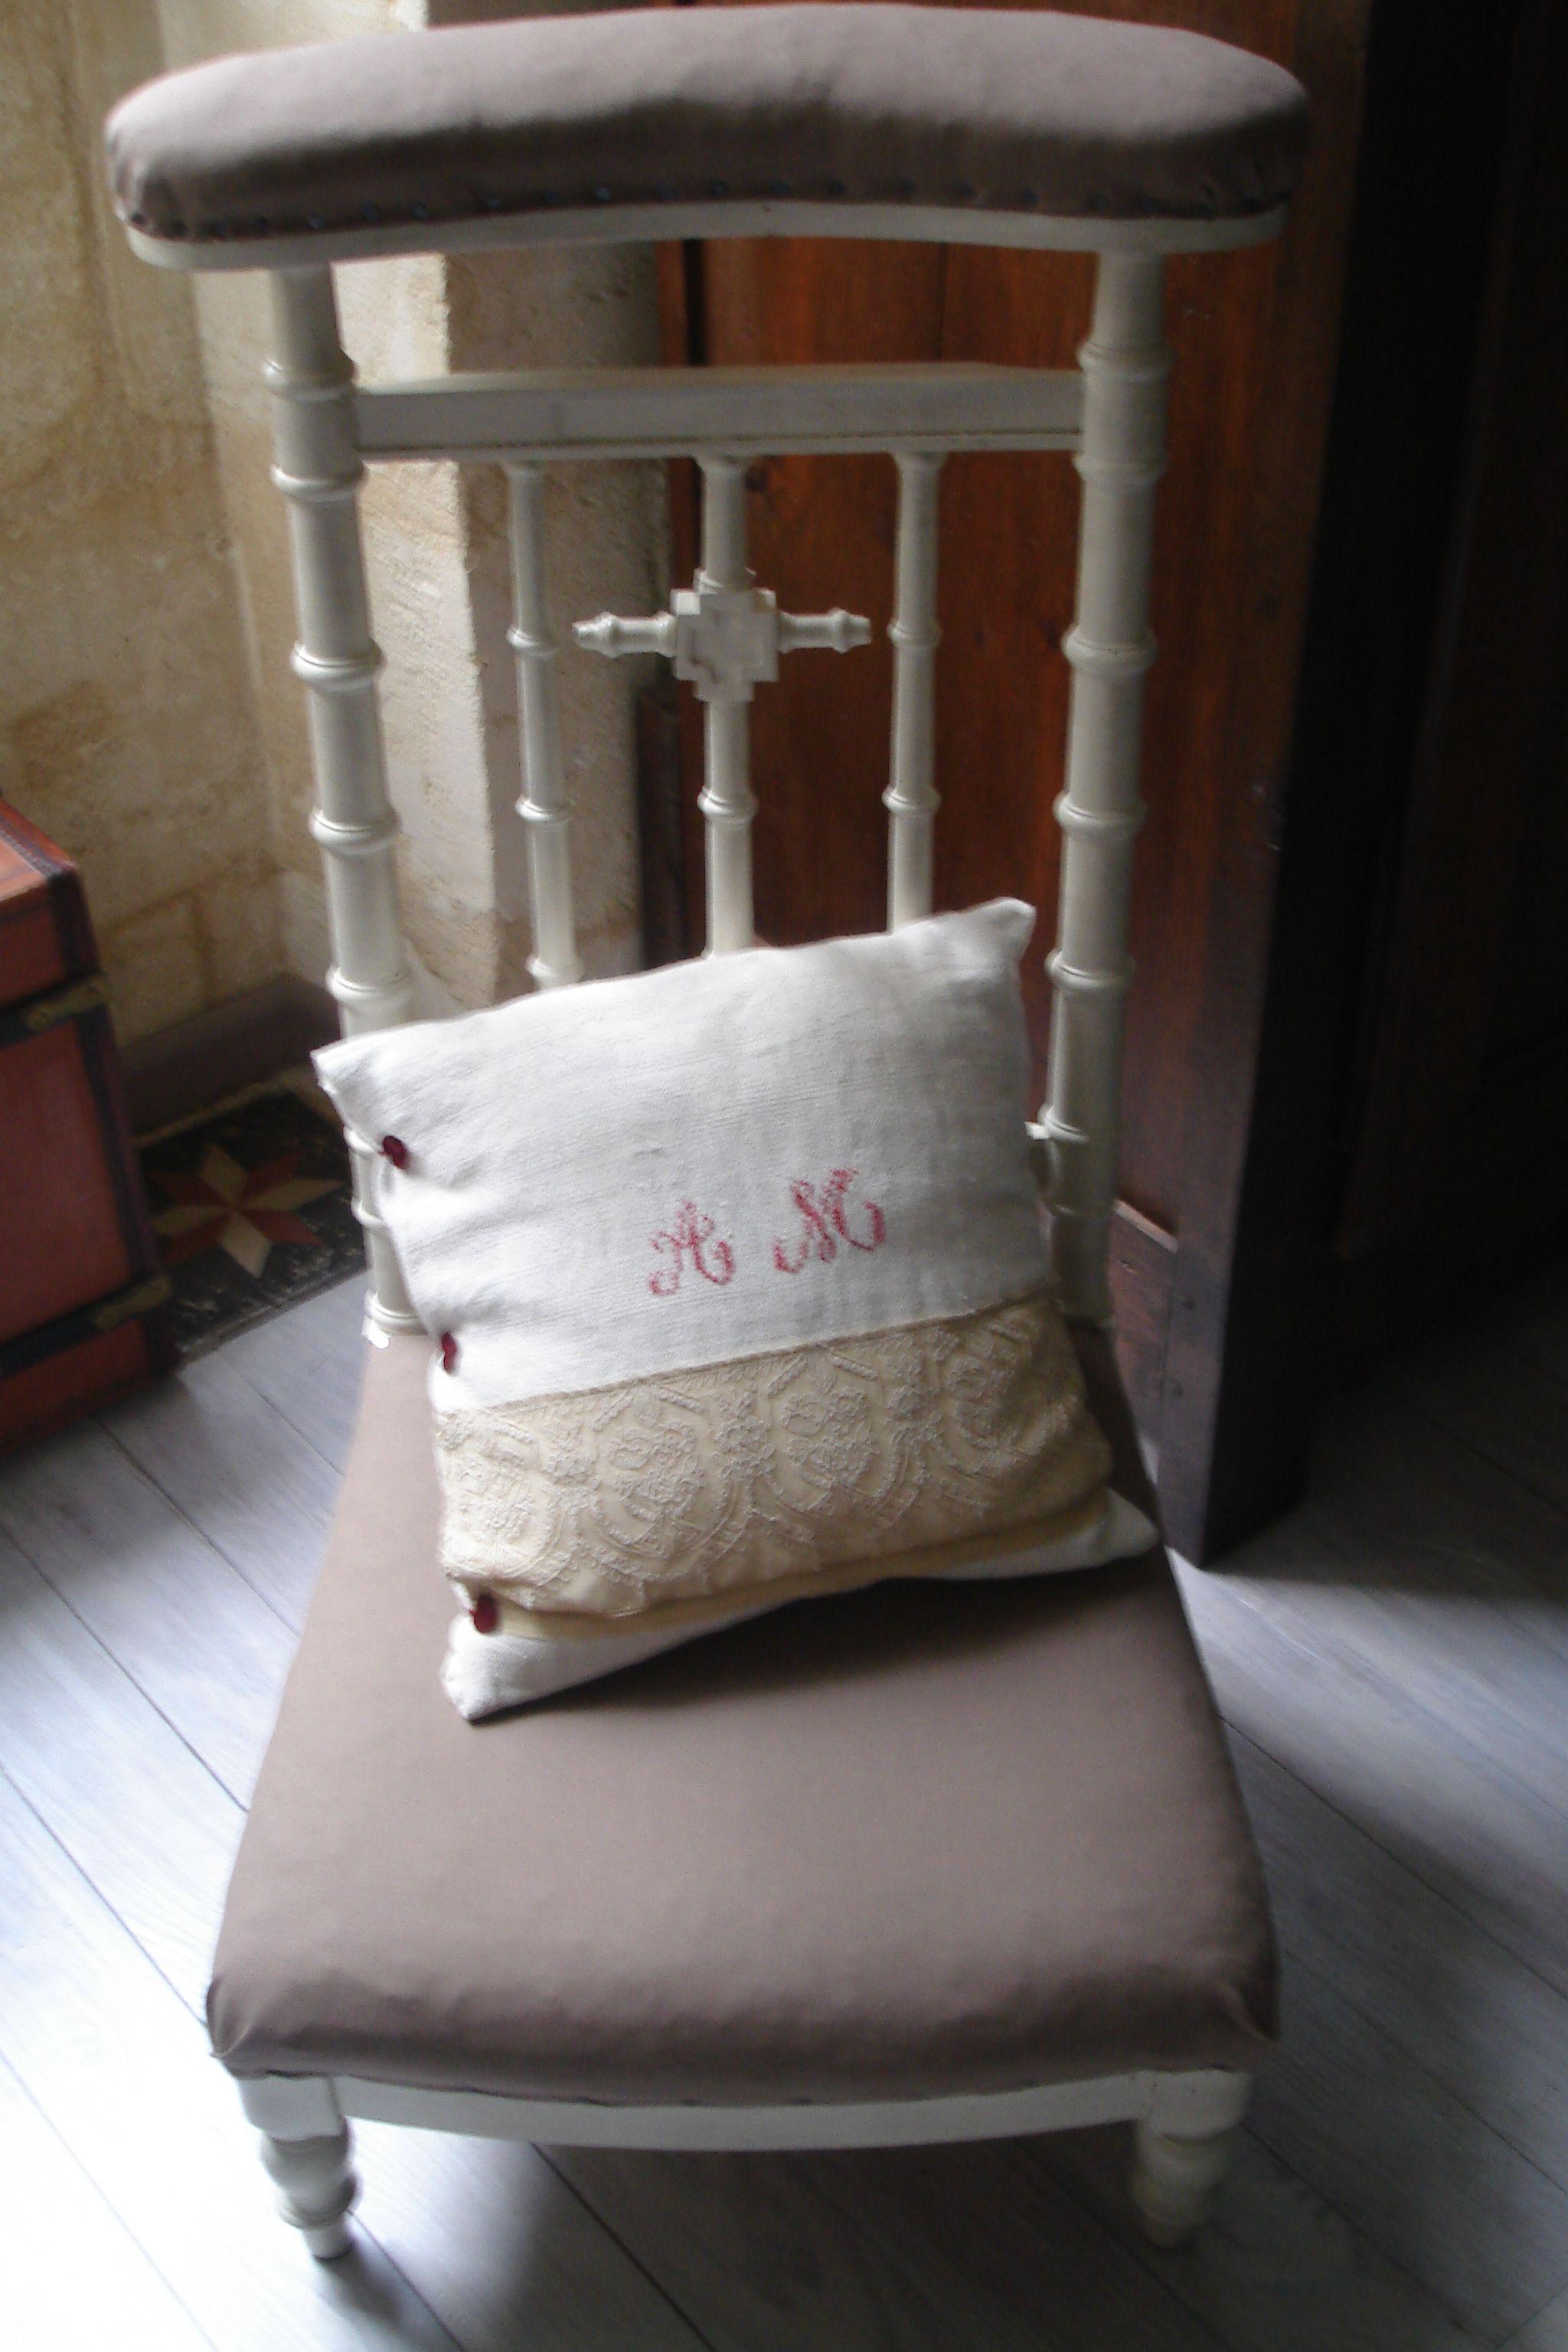 prie dieu patine ficelle tissu beige peindre meubles objets pinterest prier dieu. Black Bedroom Furniture Sets. Home Design Ideas